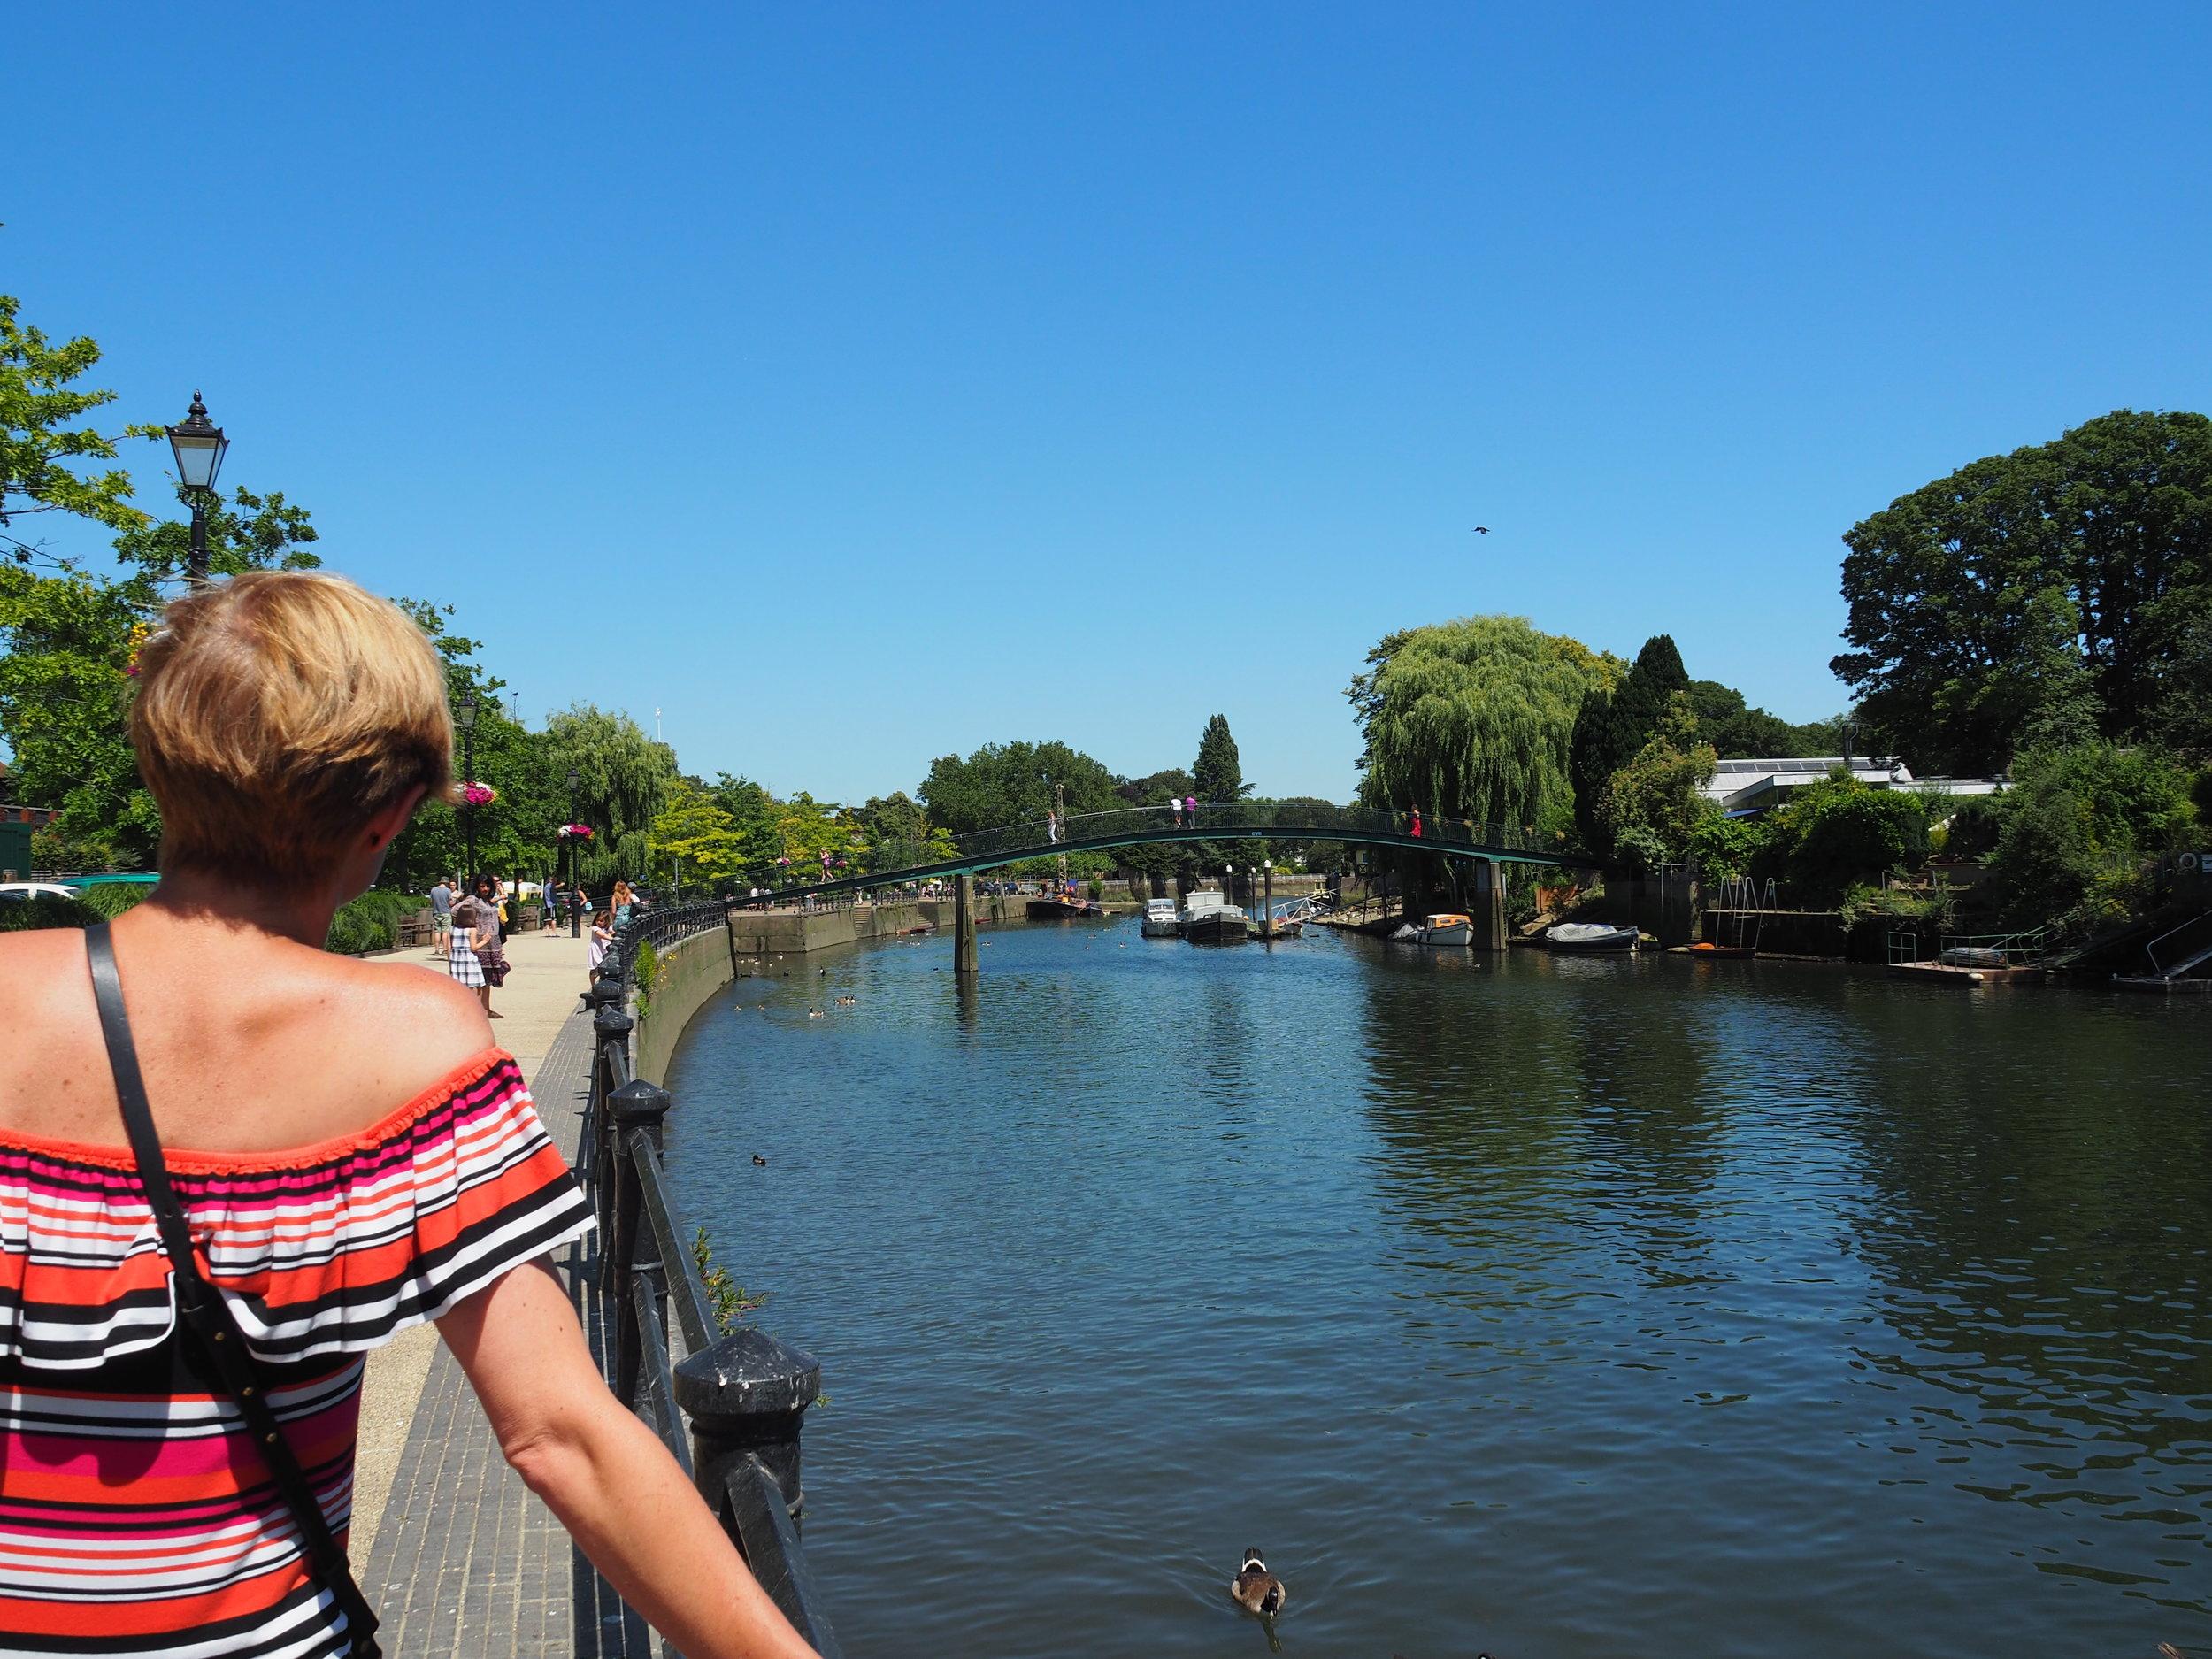 Quaint riverside walks and bridges: Check and check.